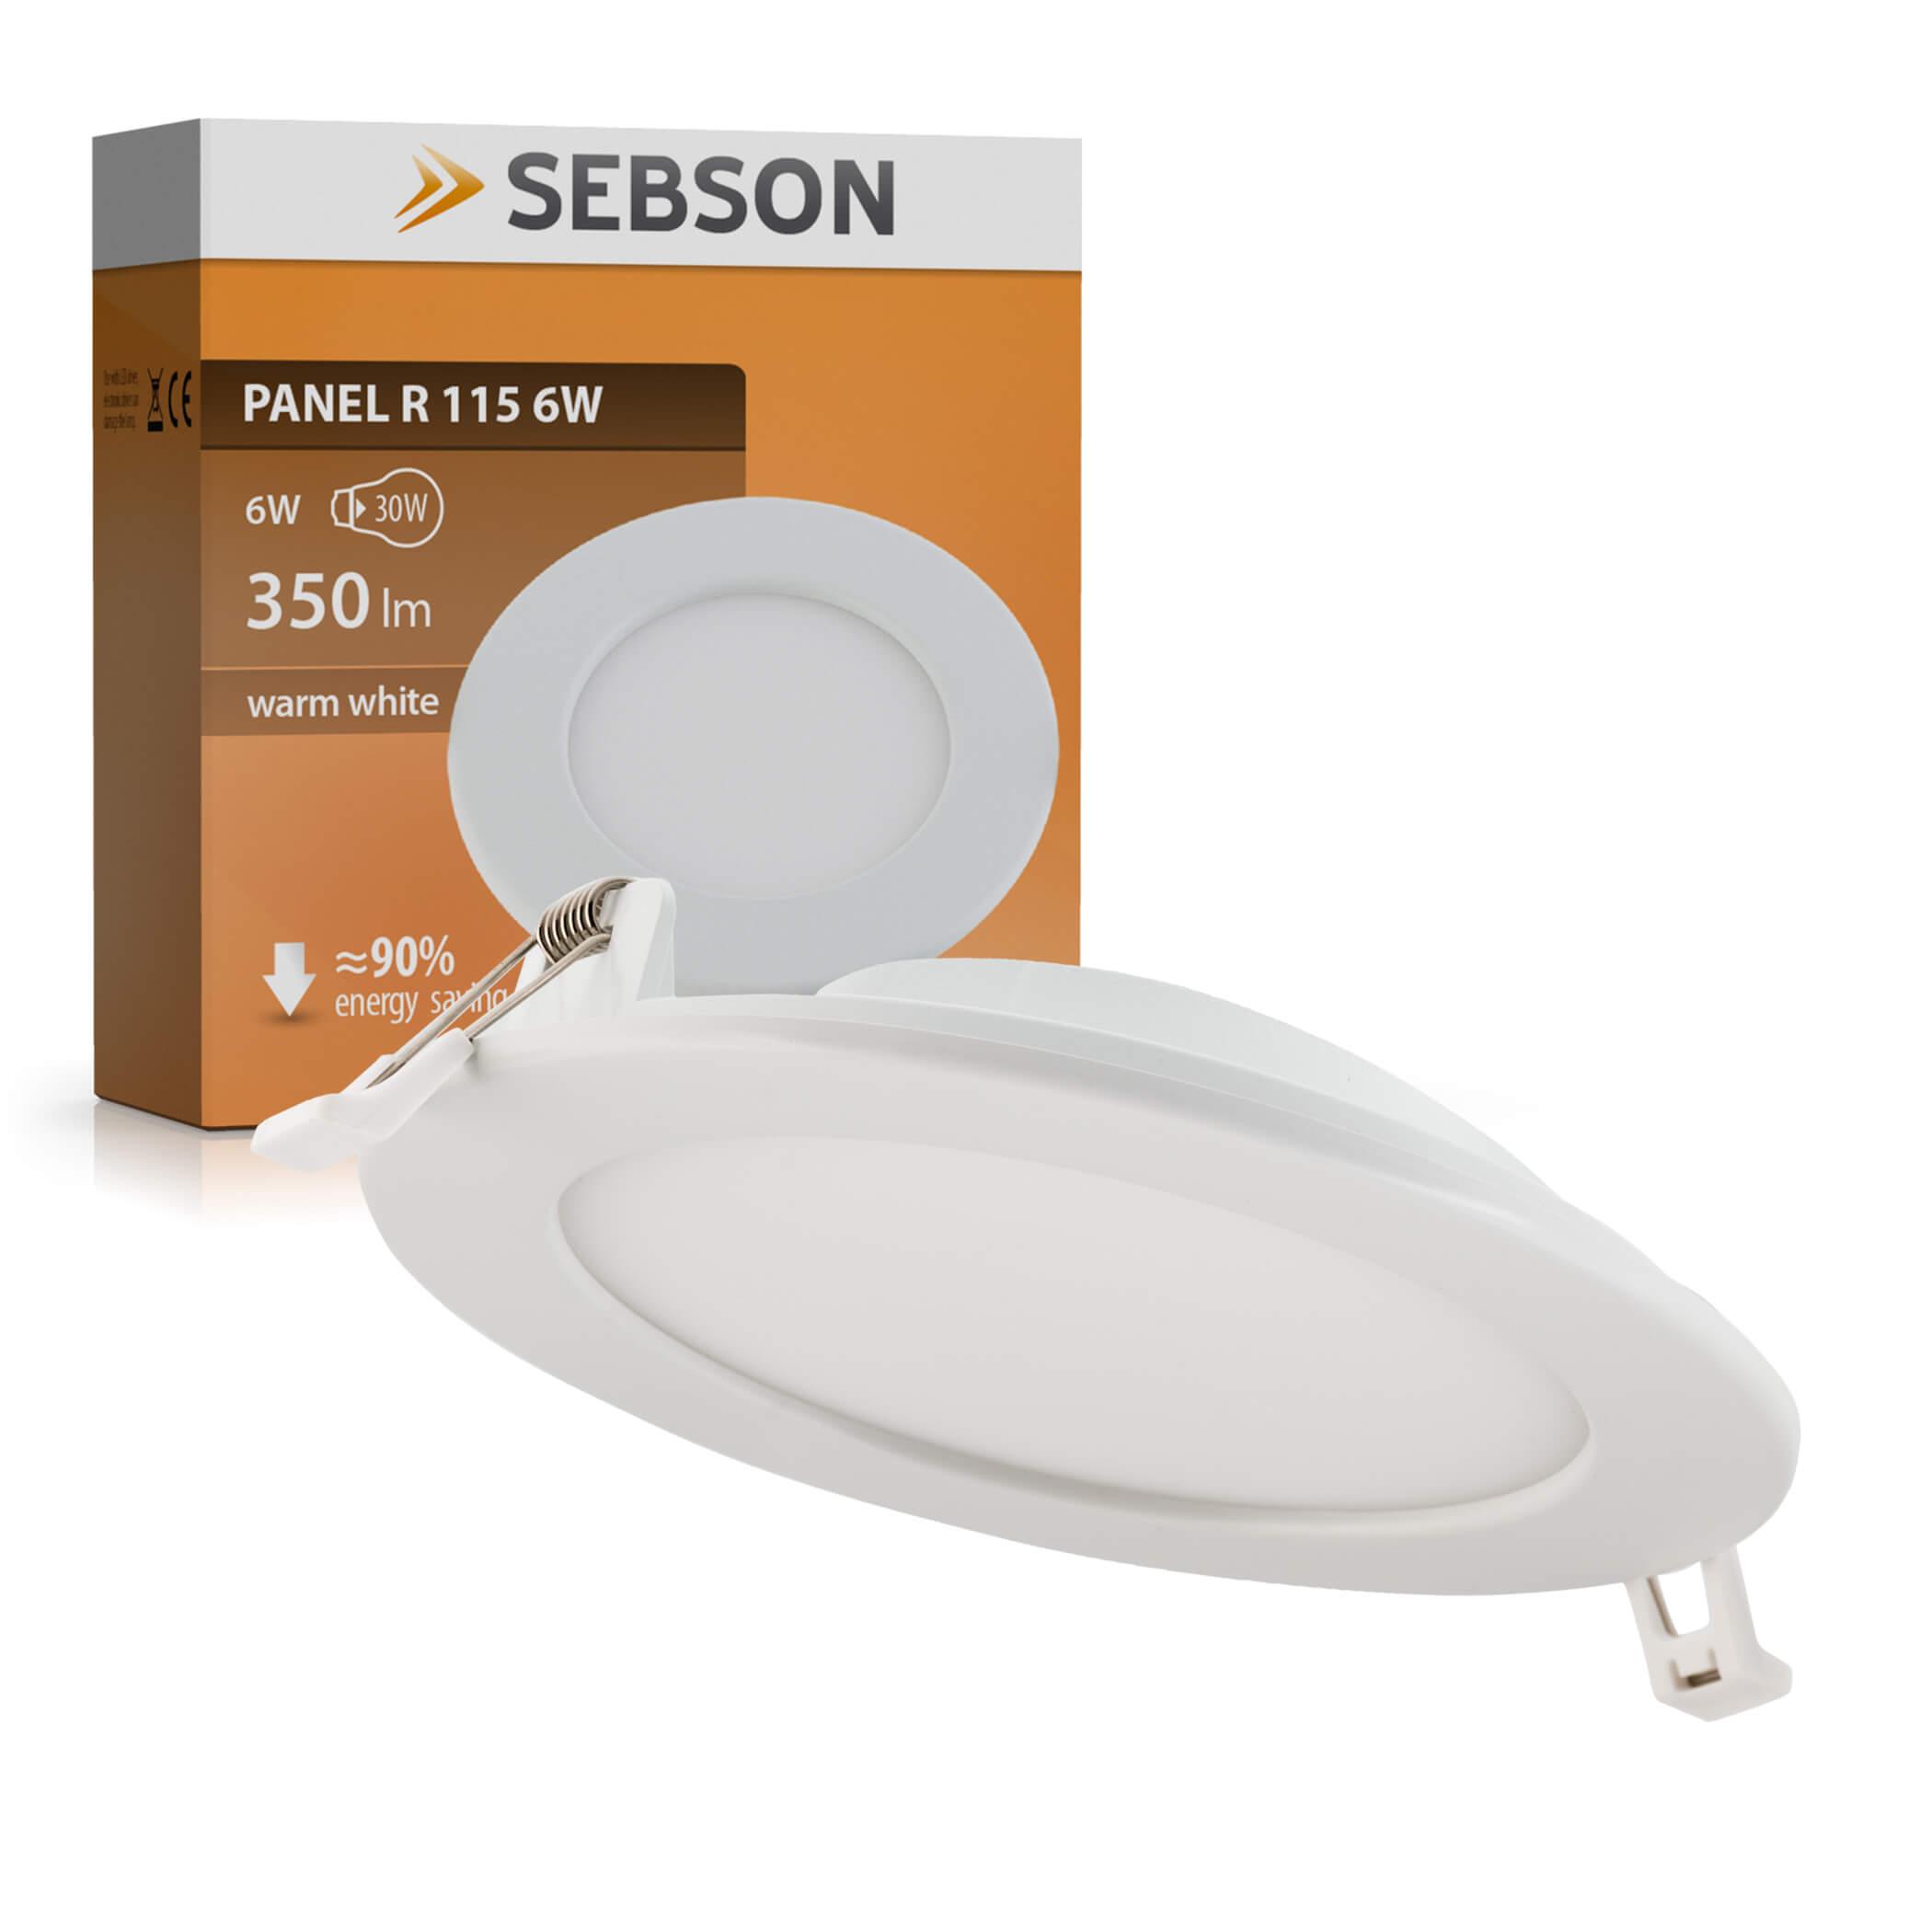 LED PANEL R115 6W